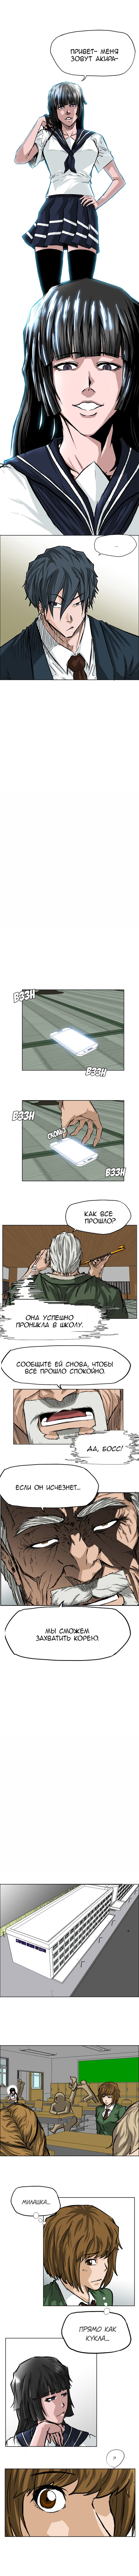 https://r2.ninemanga.com/comics/pic5/61/37949/1466852/1564397960824.jpg Page 2